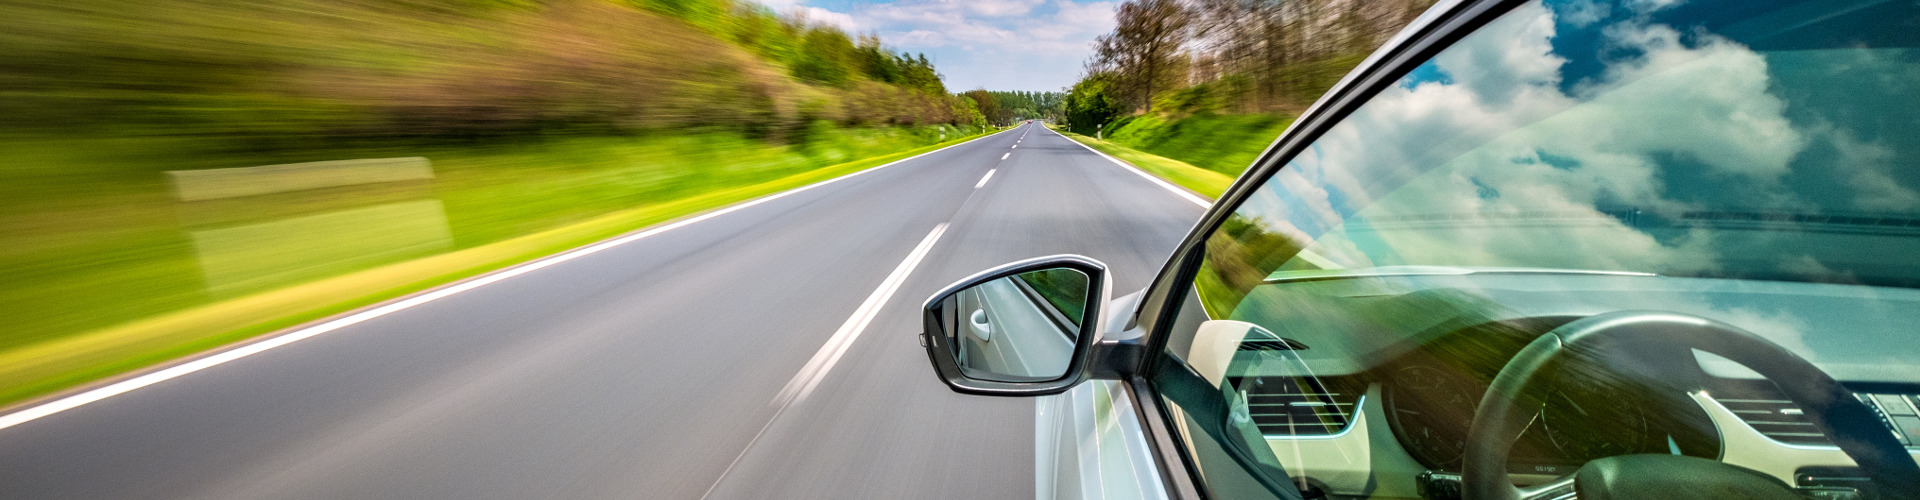 Auto Rear View Mirror Installation & Repair Service in Snohomish